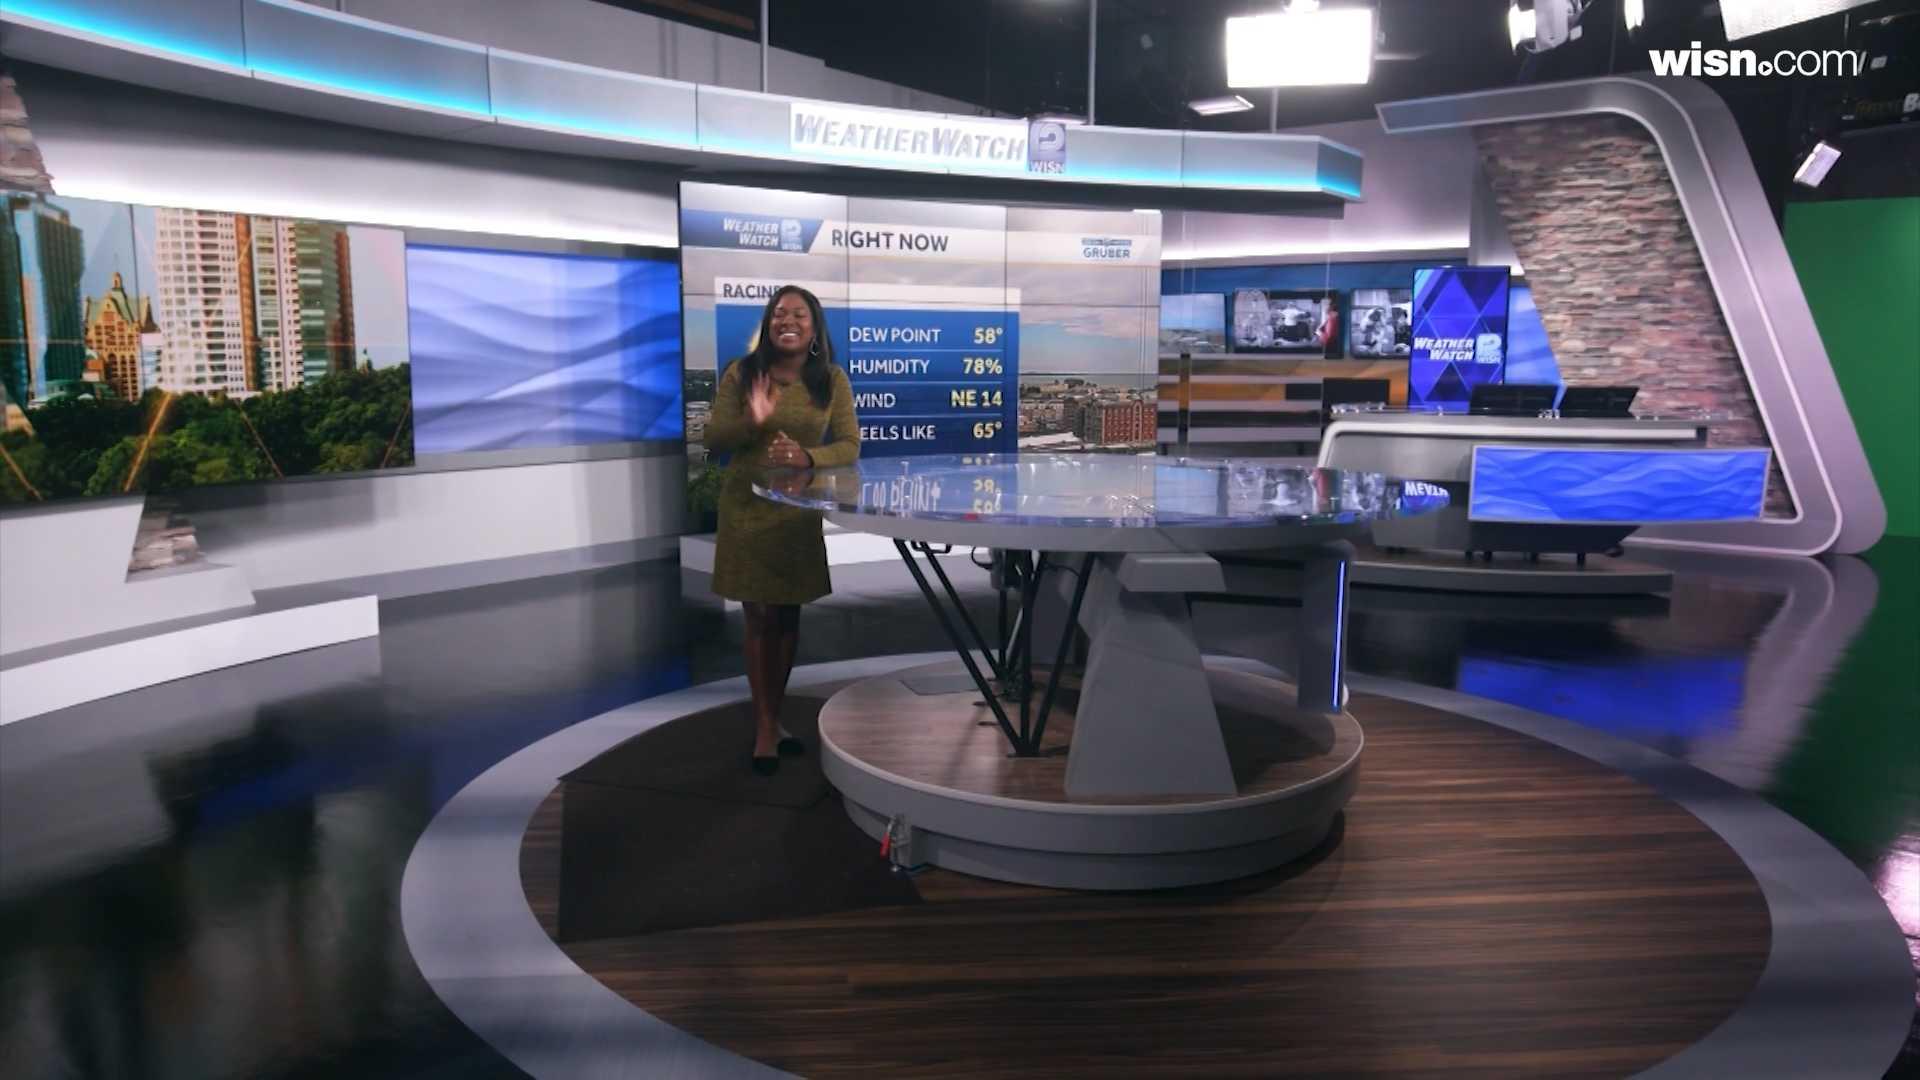 Take a tour of WISN 12 NEWS' new home